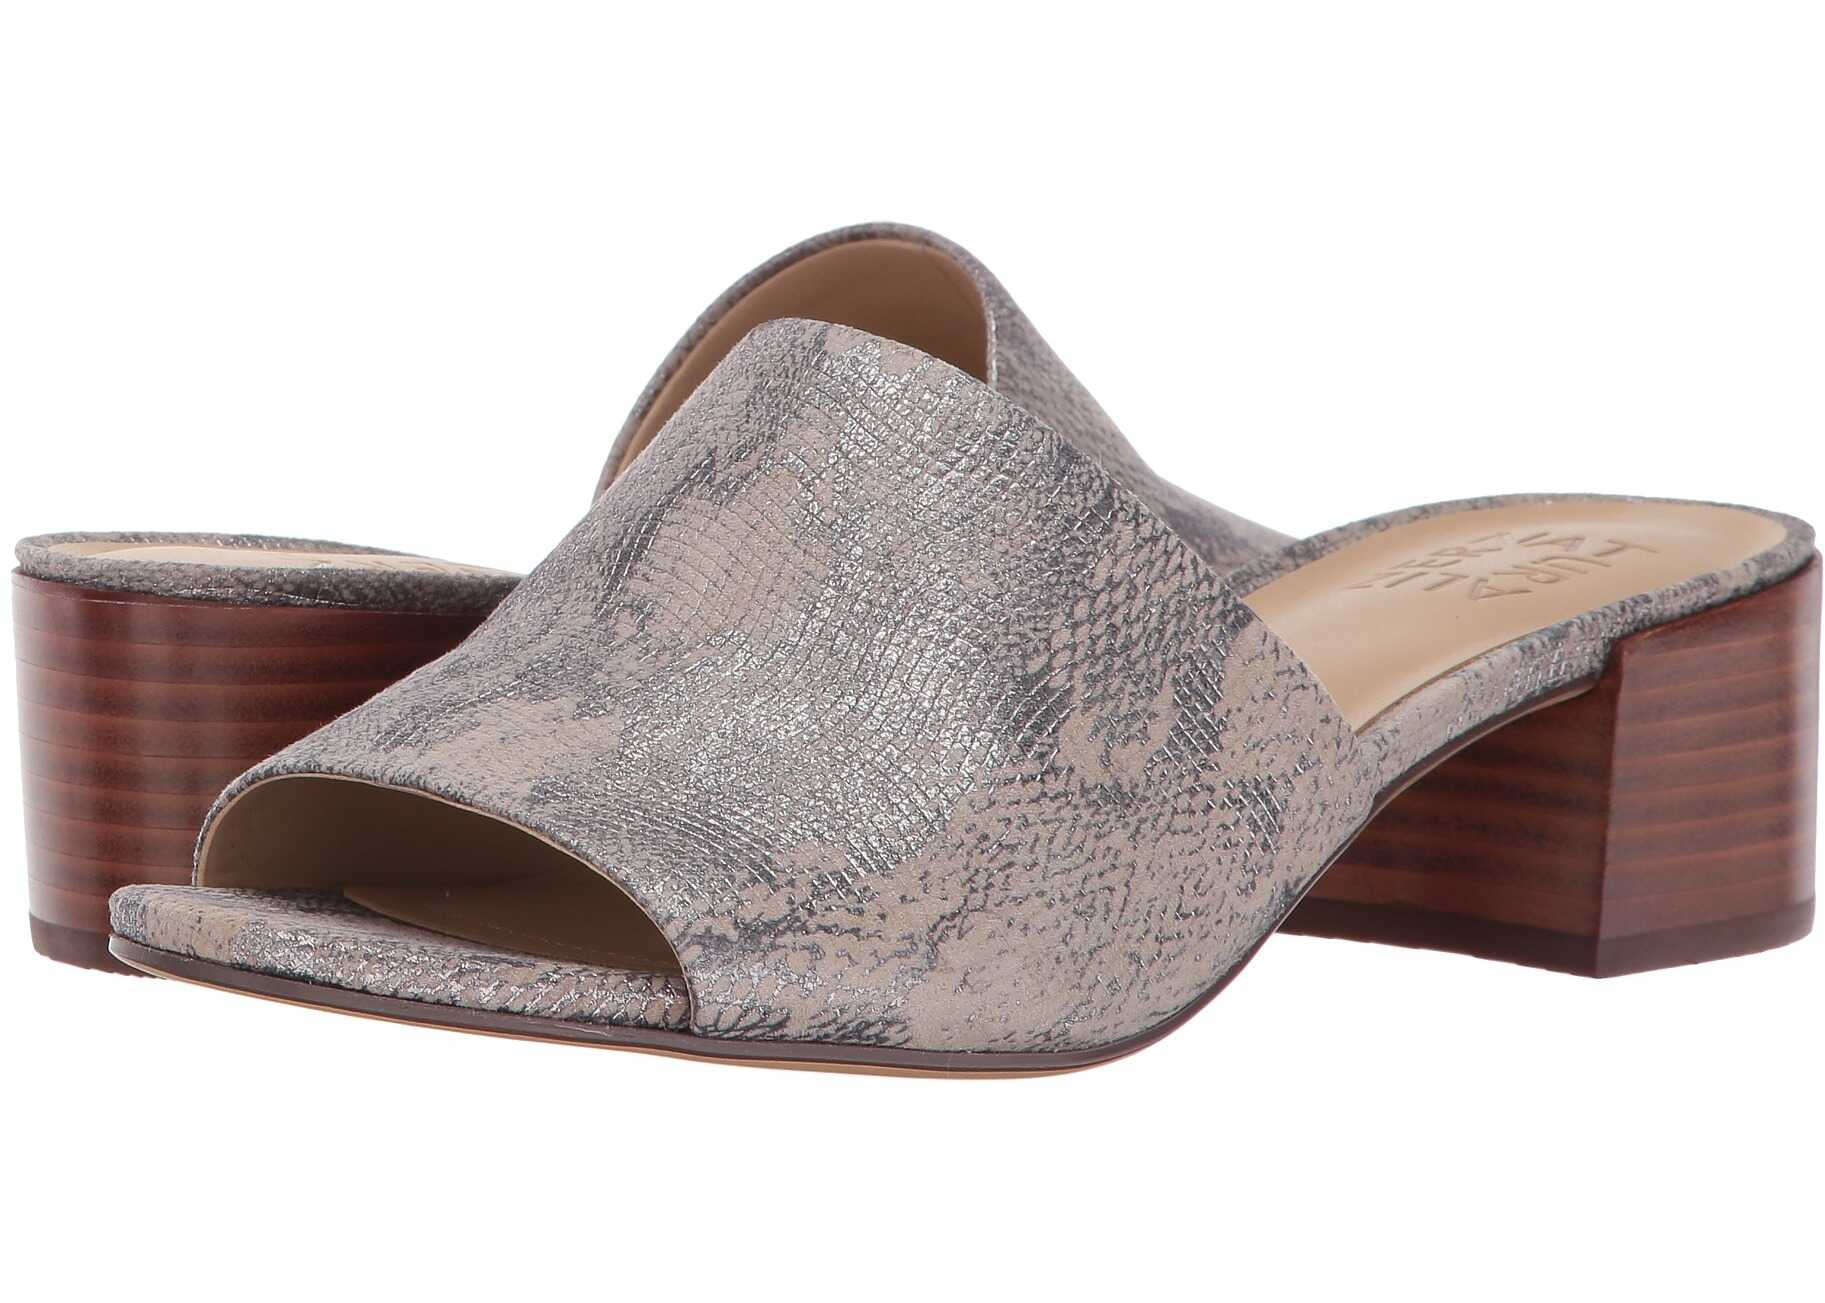 Naturalizer Fairley Silver Grey Metallic Snake Leather